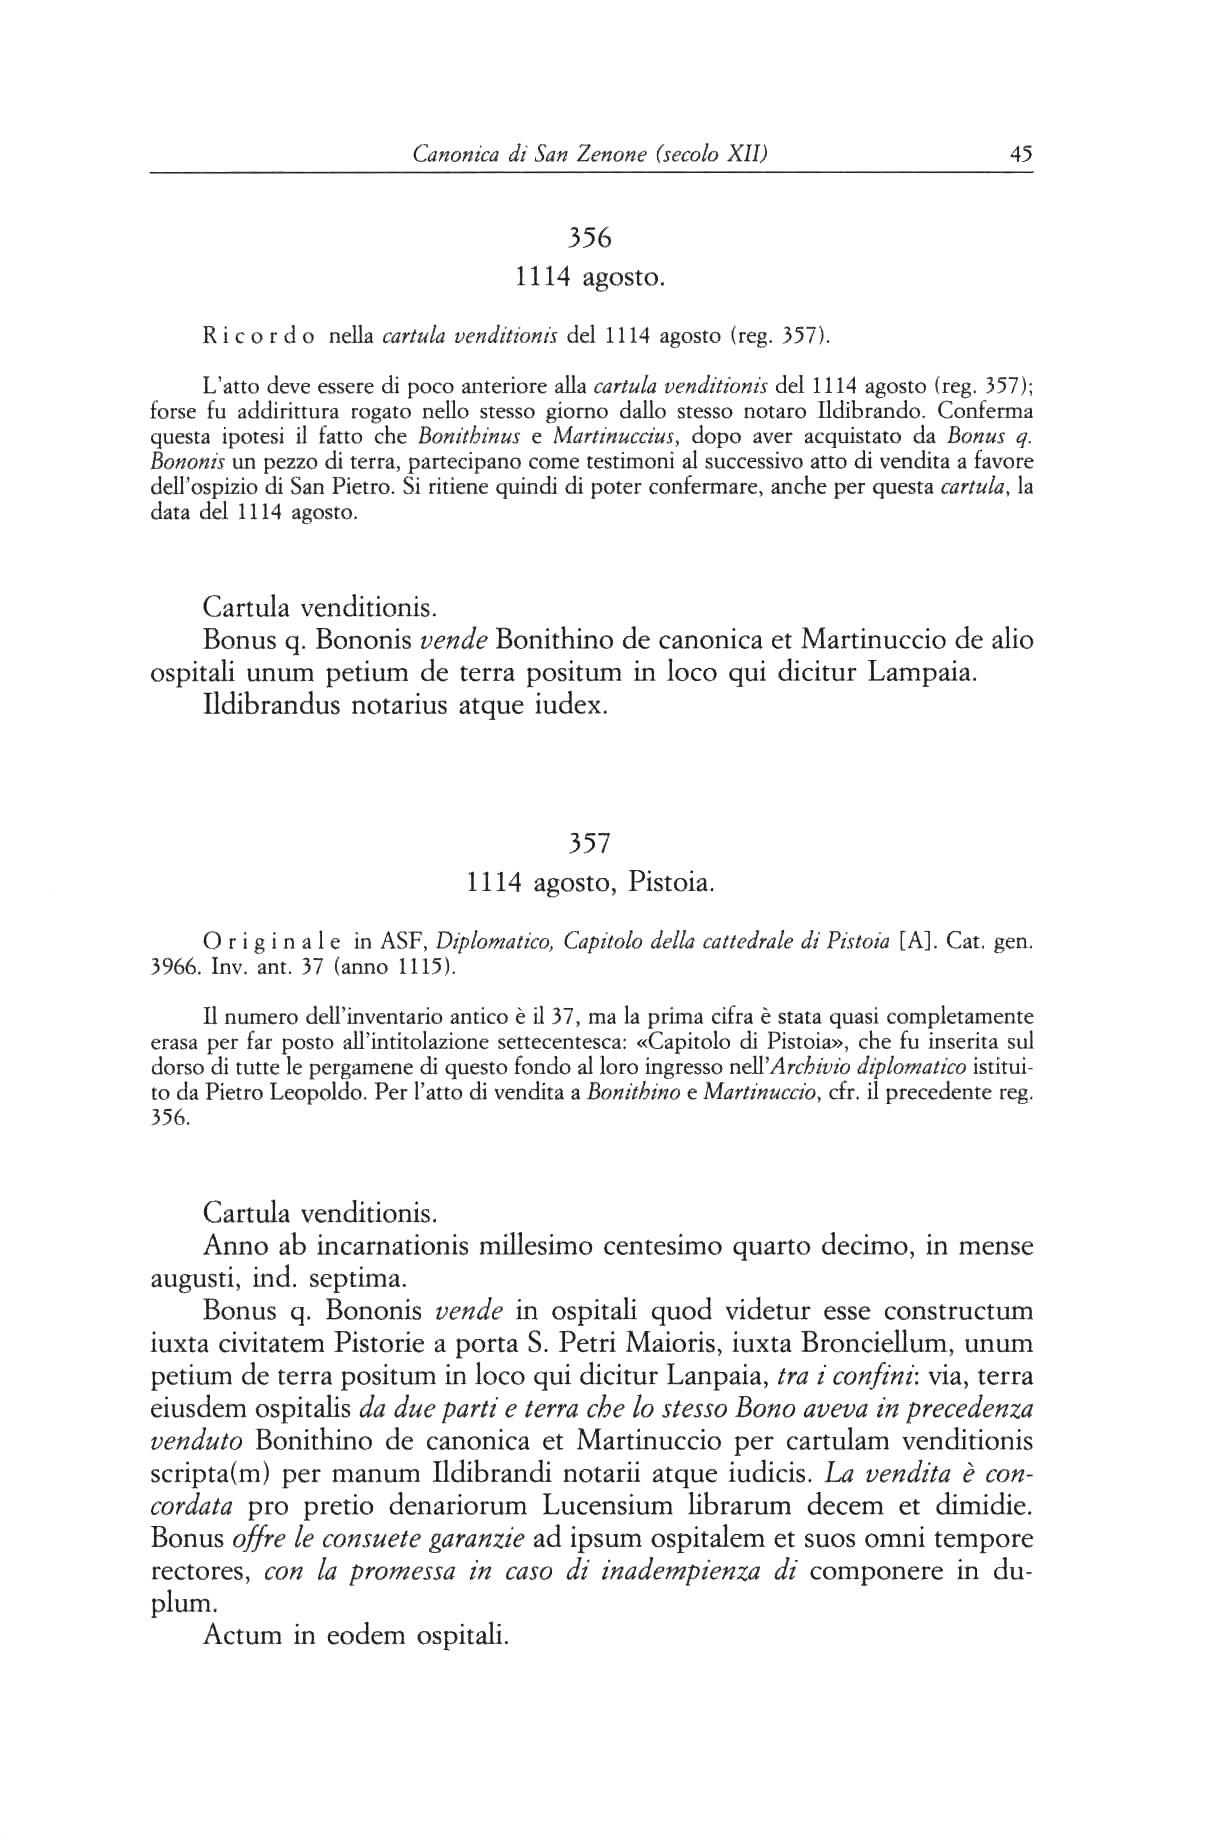 Canonica S. Zenone XII 0045.jpg